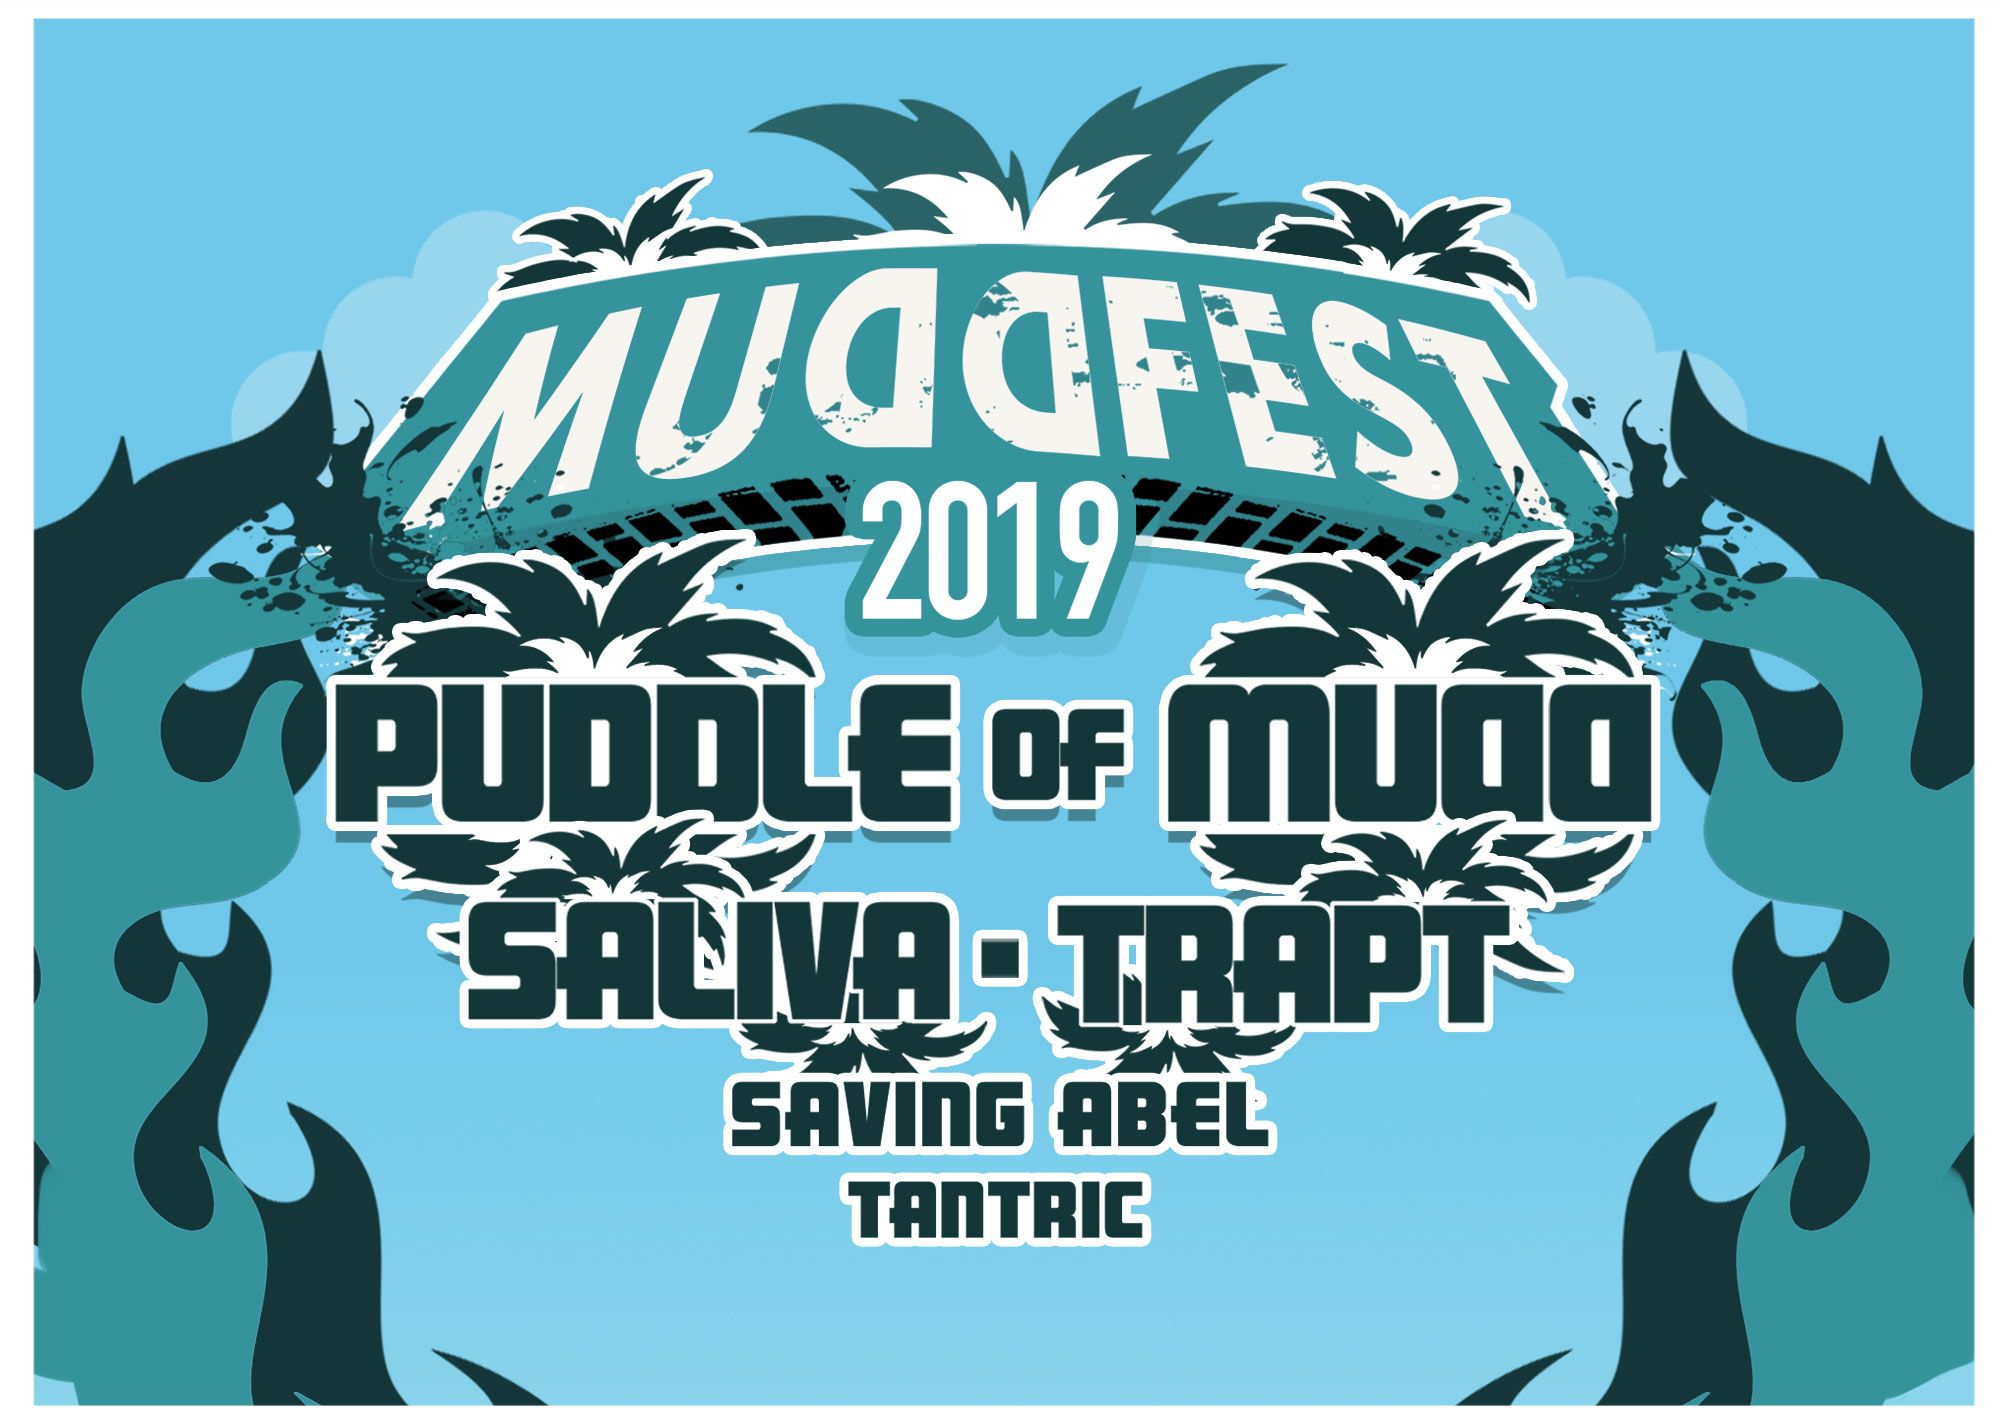 Muddfest 2019: Puddle of Mudd, Saliva, Trapt, Saving Abel